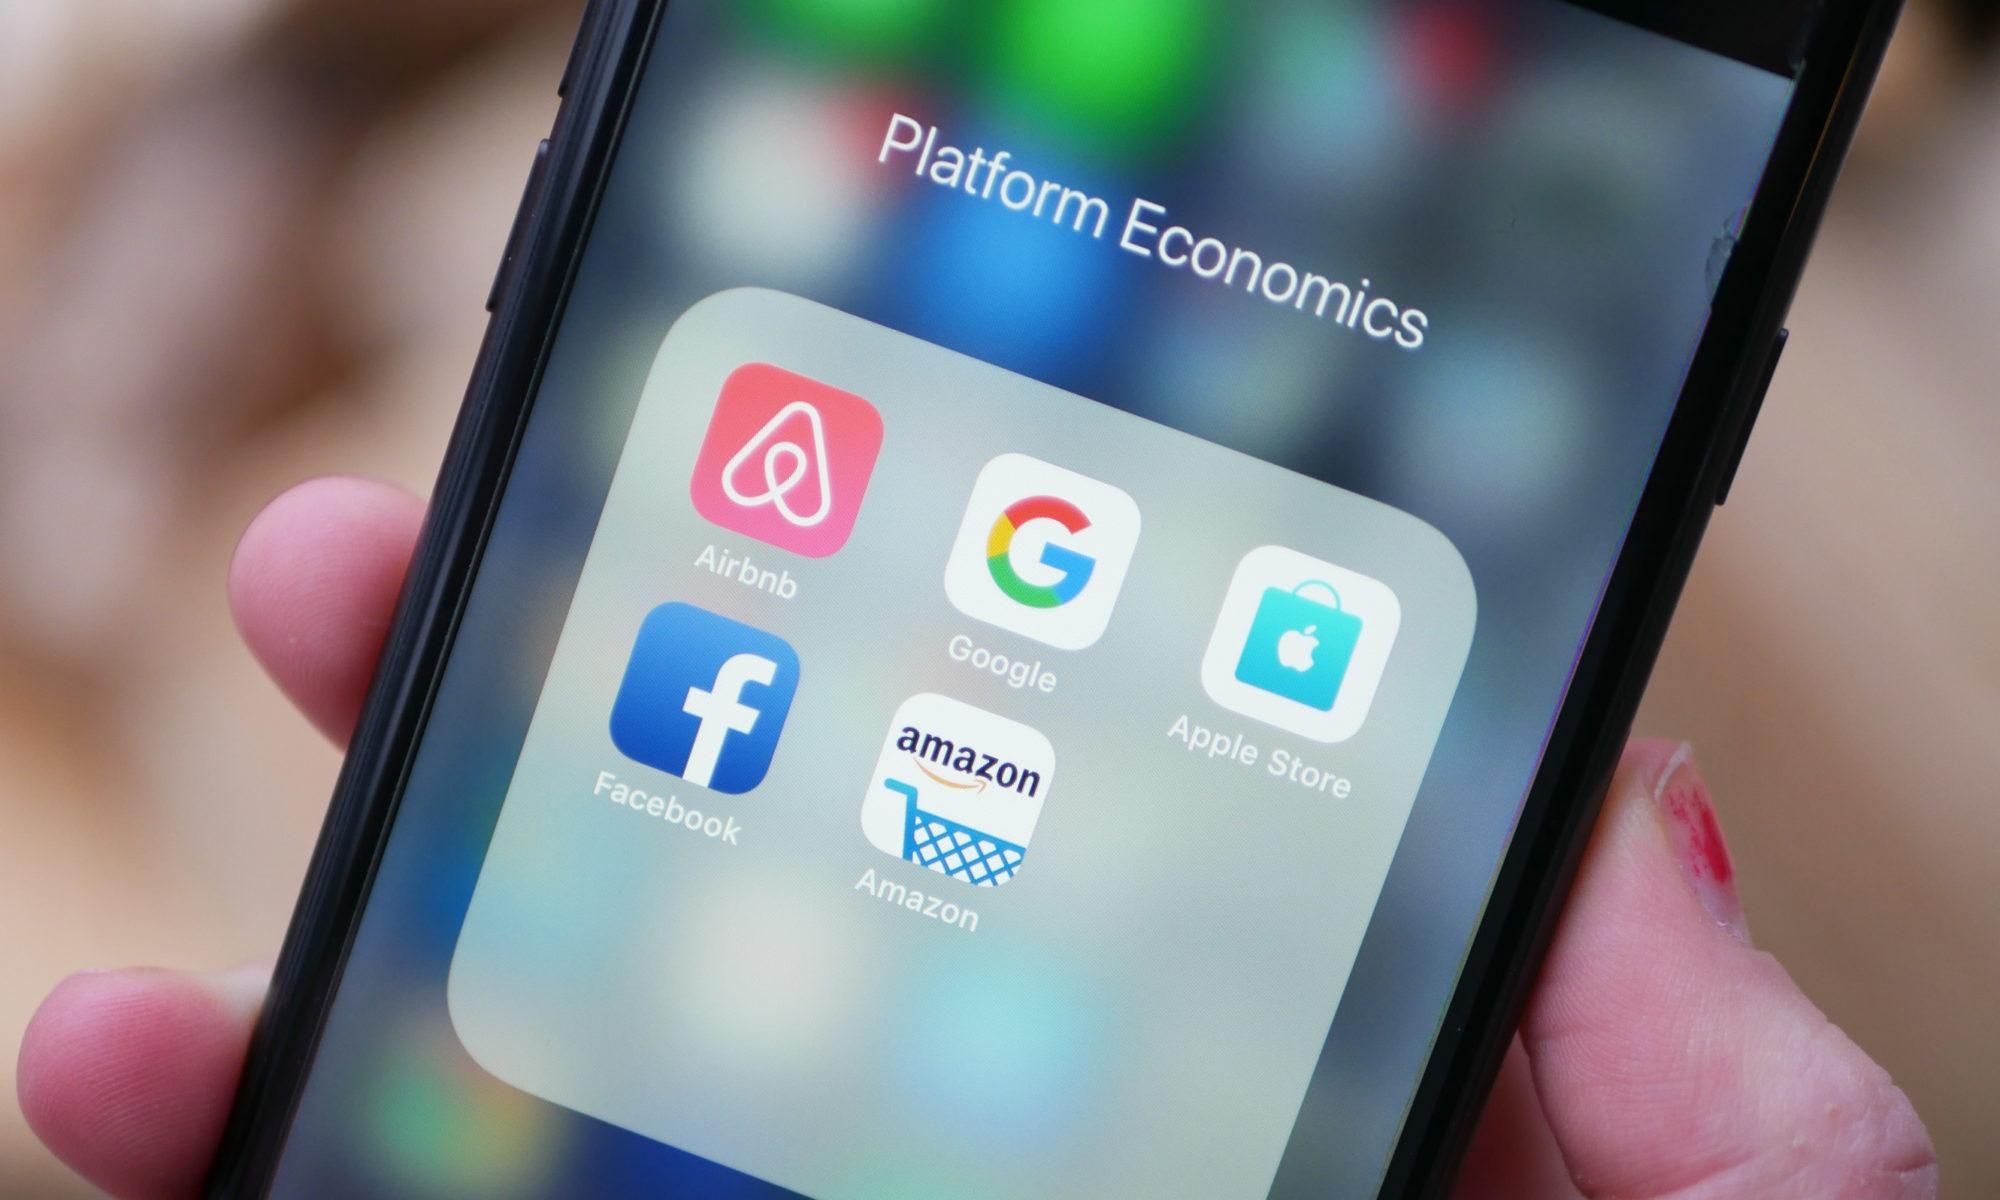 Smartphone-Screen mit Plattform-Apps